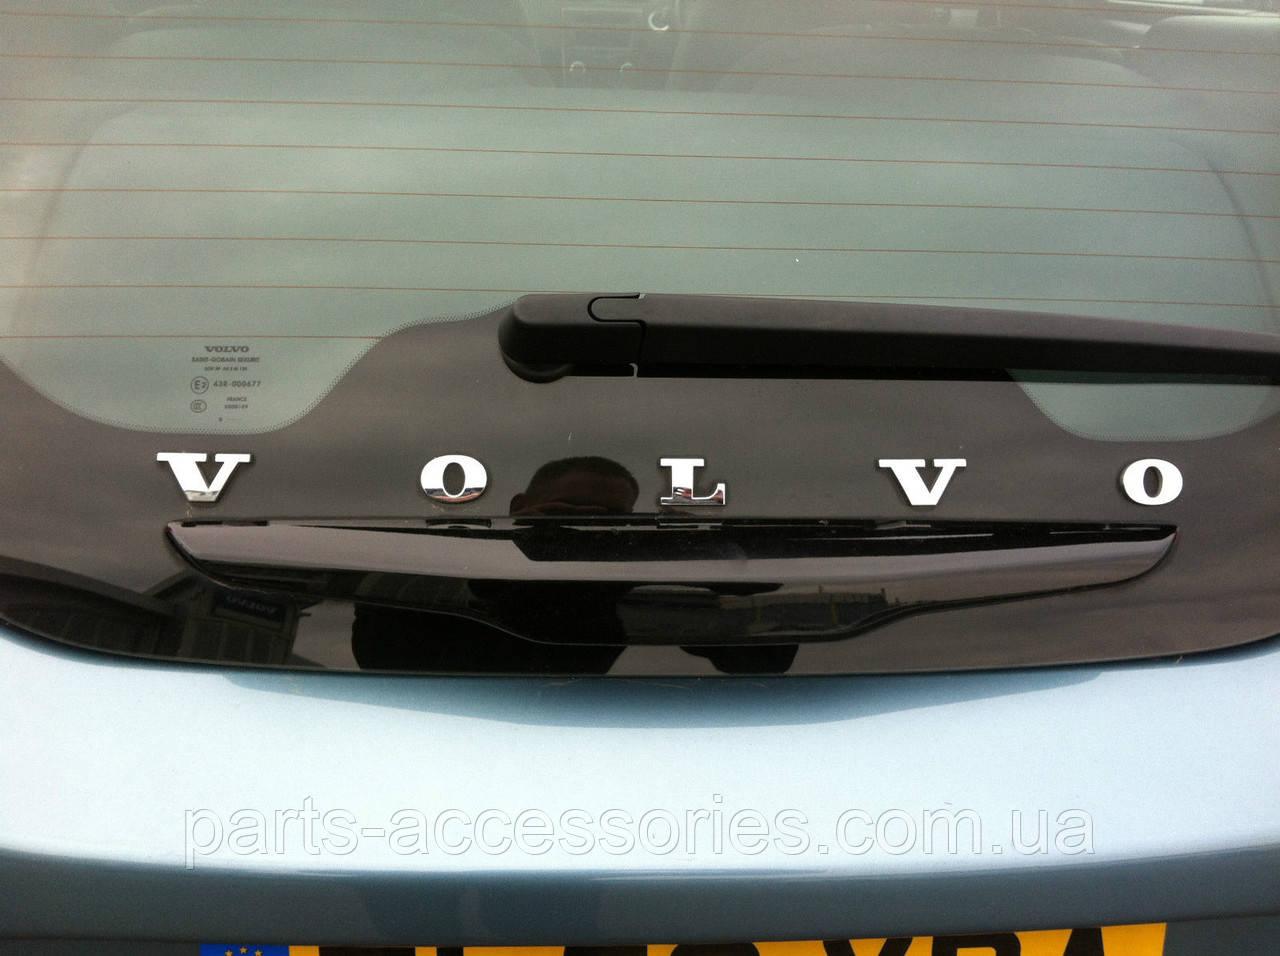 Volvo C30 2007-13 эмблема значок надпись на багажник новая оригинал